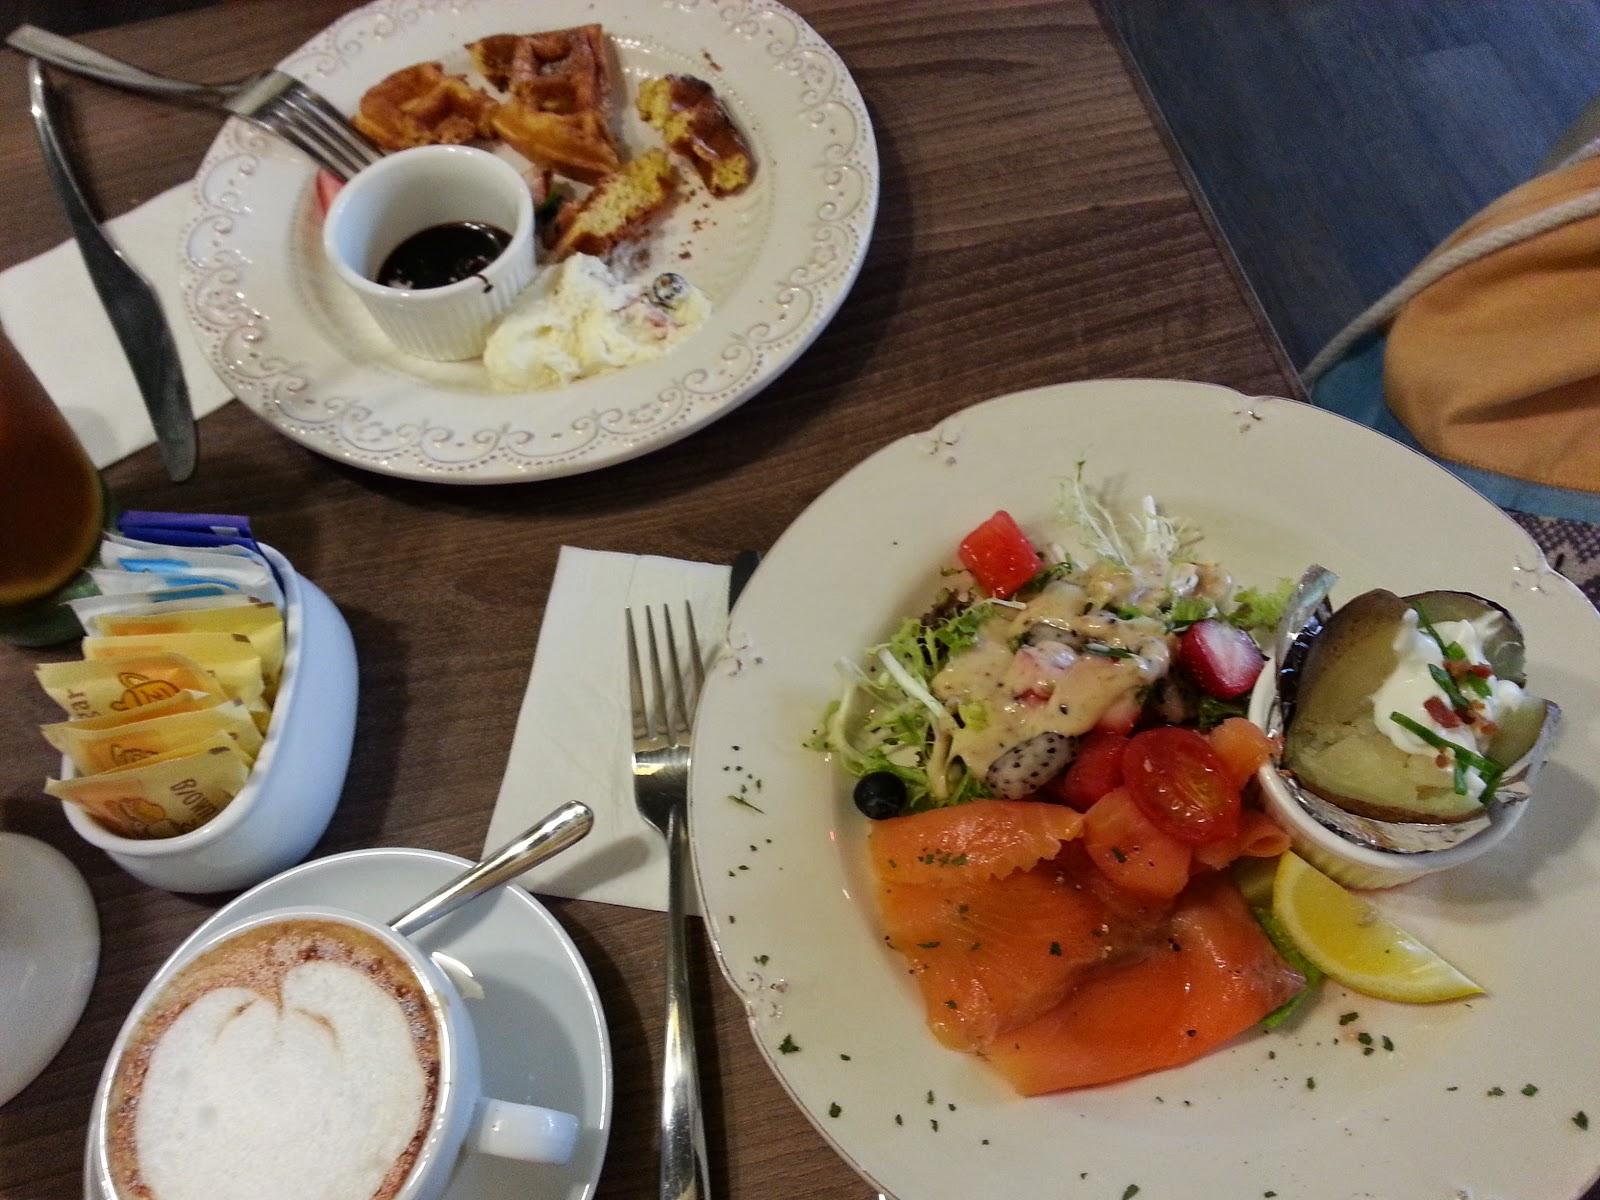 Girls Talk High Tea 推介: Fine Day Cafe - 朱古力窩夫 @ 尖沙咀柯士甸路 @ Double Cream 的交換日記 - Double Cream Sharing Blog for ...